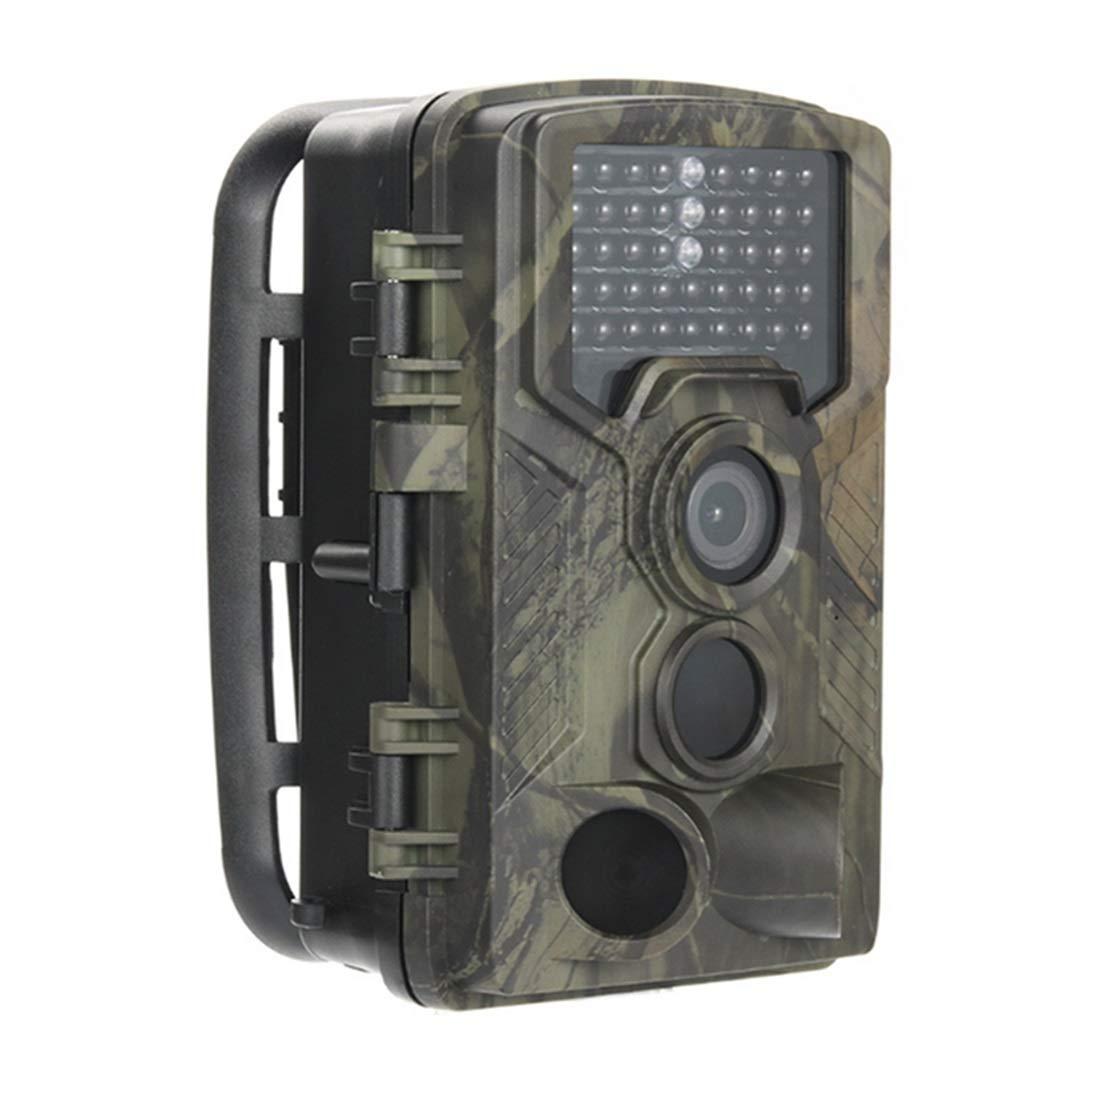 Linannau 1080P 12MP HD屋外狩猟カメラ、940nm IR LEDナイトビジョン、0.3秒トリガ時間、2.0